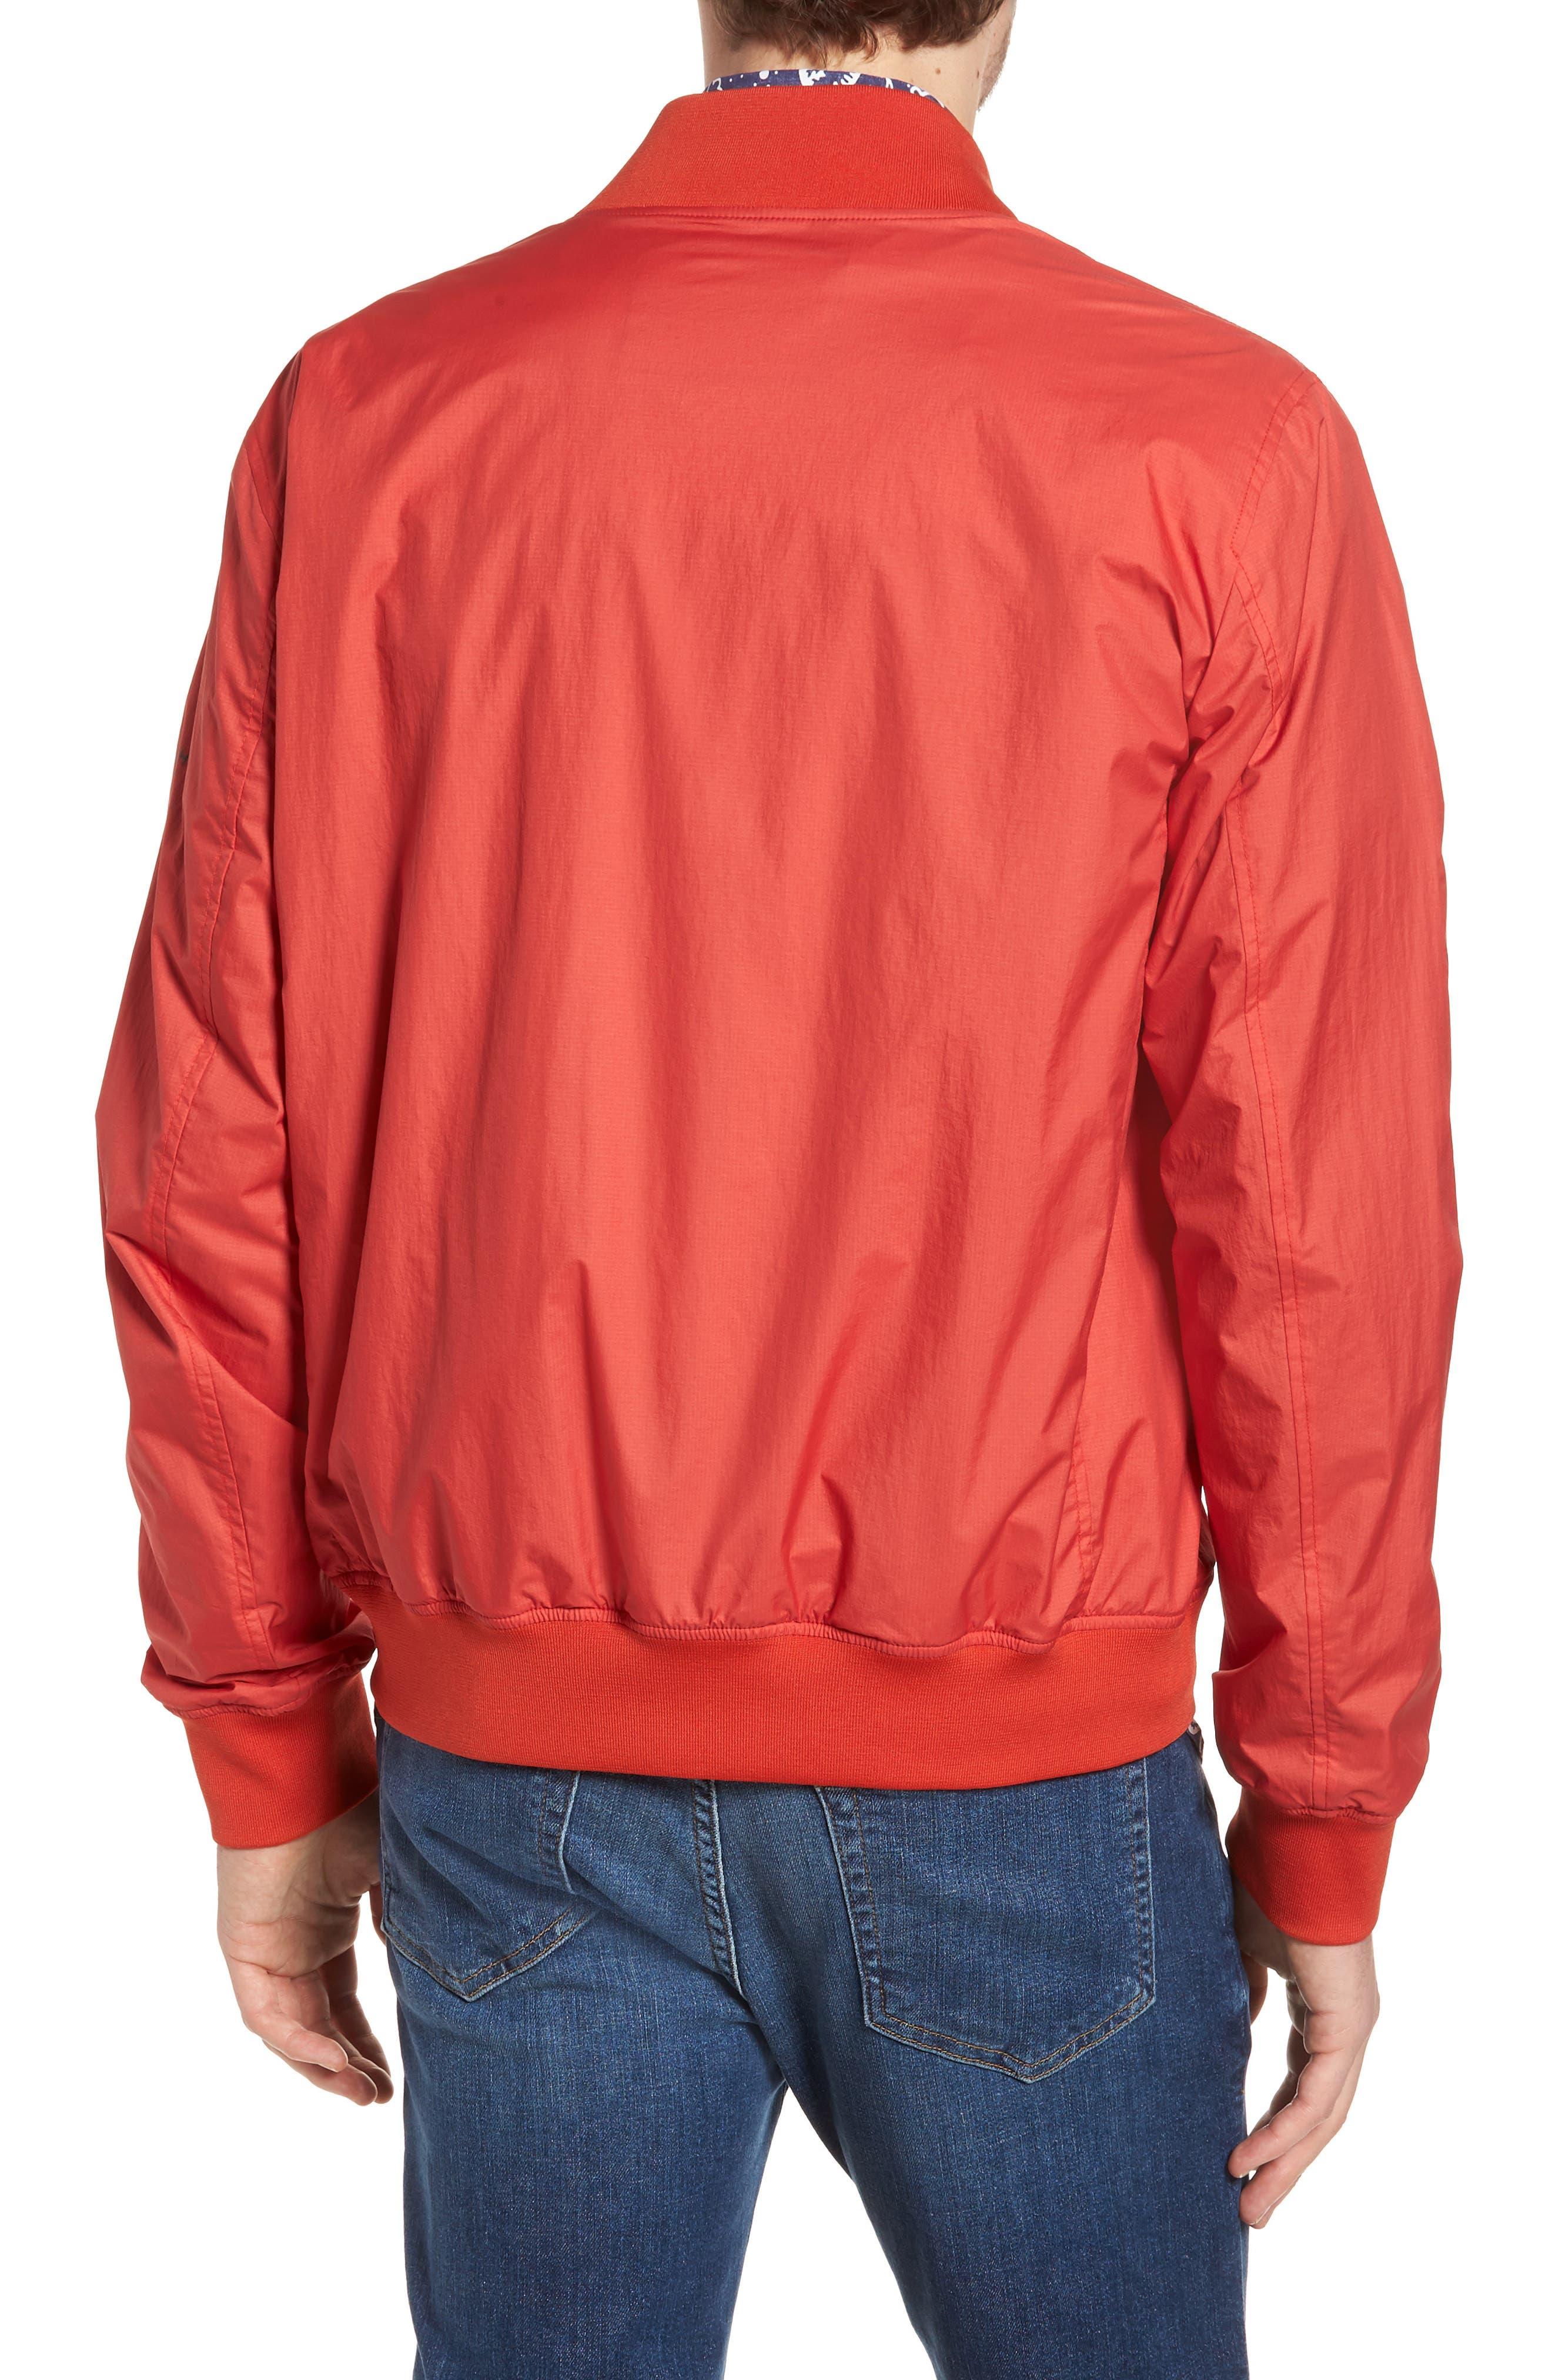 Wallaby Bomber Jacket,                             Alternate thumbnail 2, color,                             646